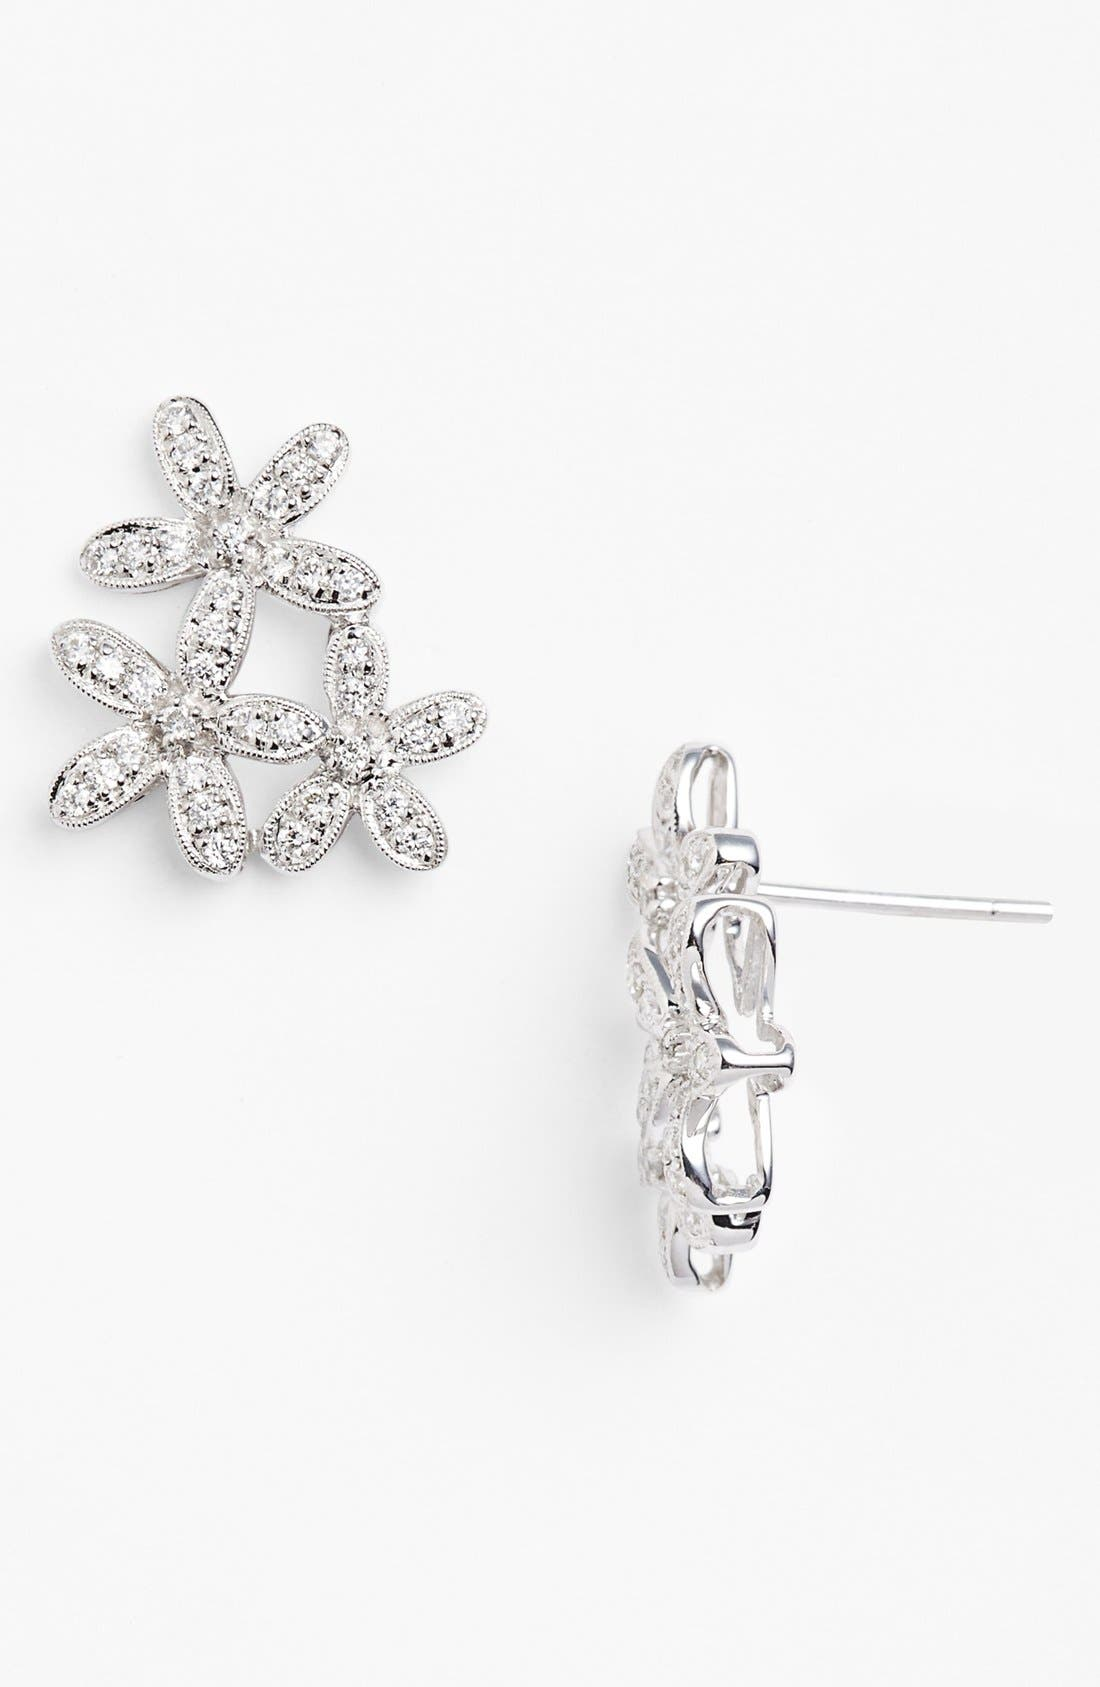 Main Image - Dana Rebecca Designs 'Agnes Fortune' Diamond Flower Stud Earrings